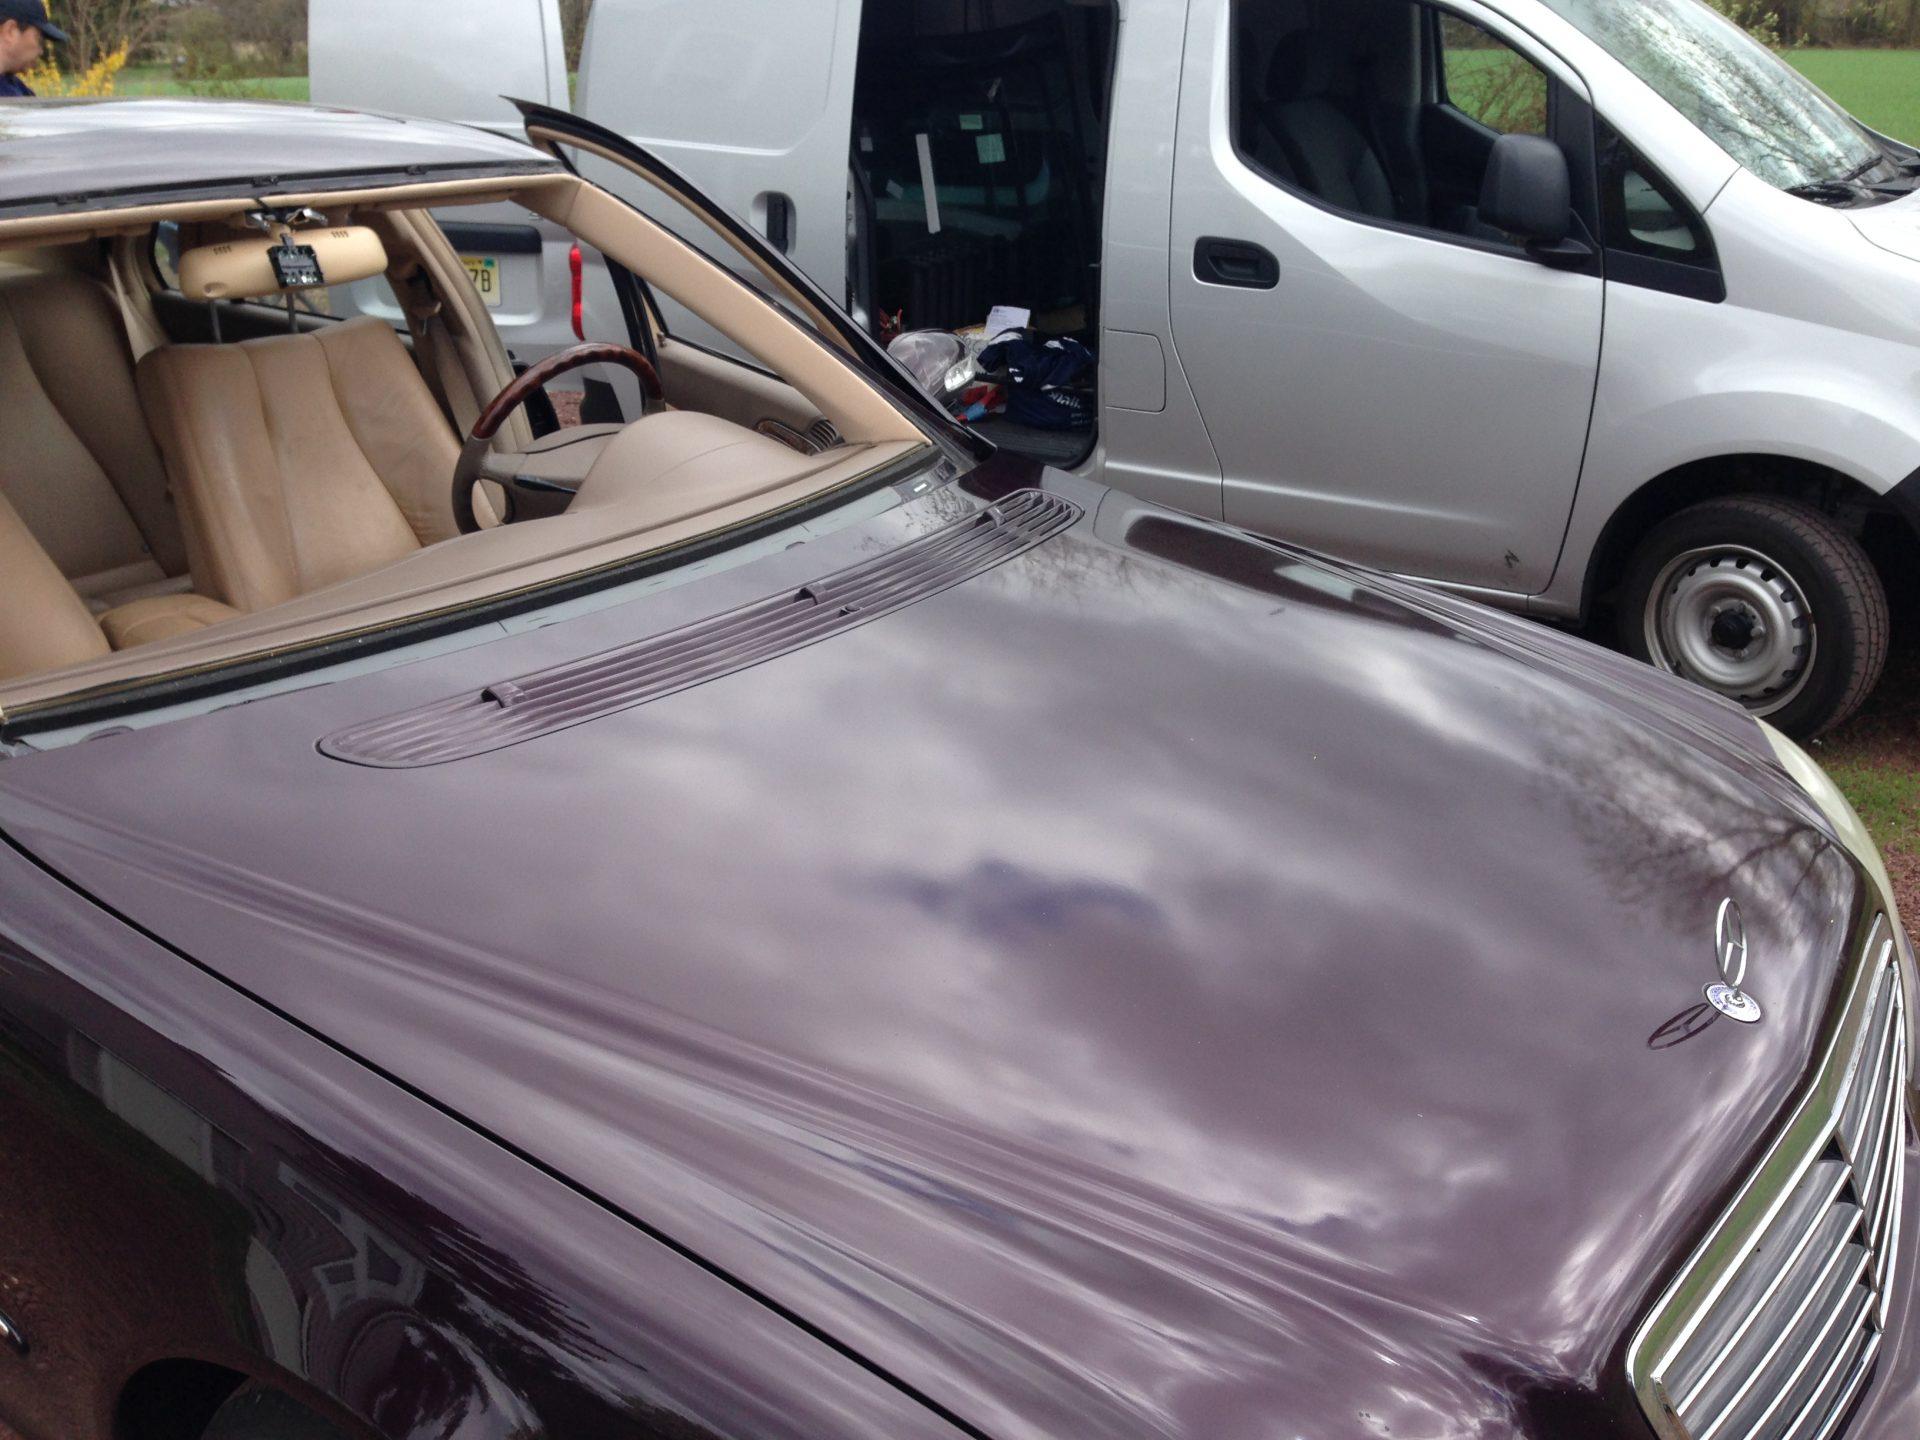 2002 S500 Mercedes Benz ready for a new windshield Install Platinum Auto Glass NJ @732-993-6844@platinumautoglassnj